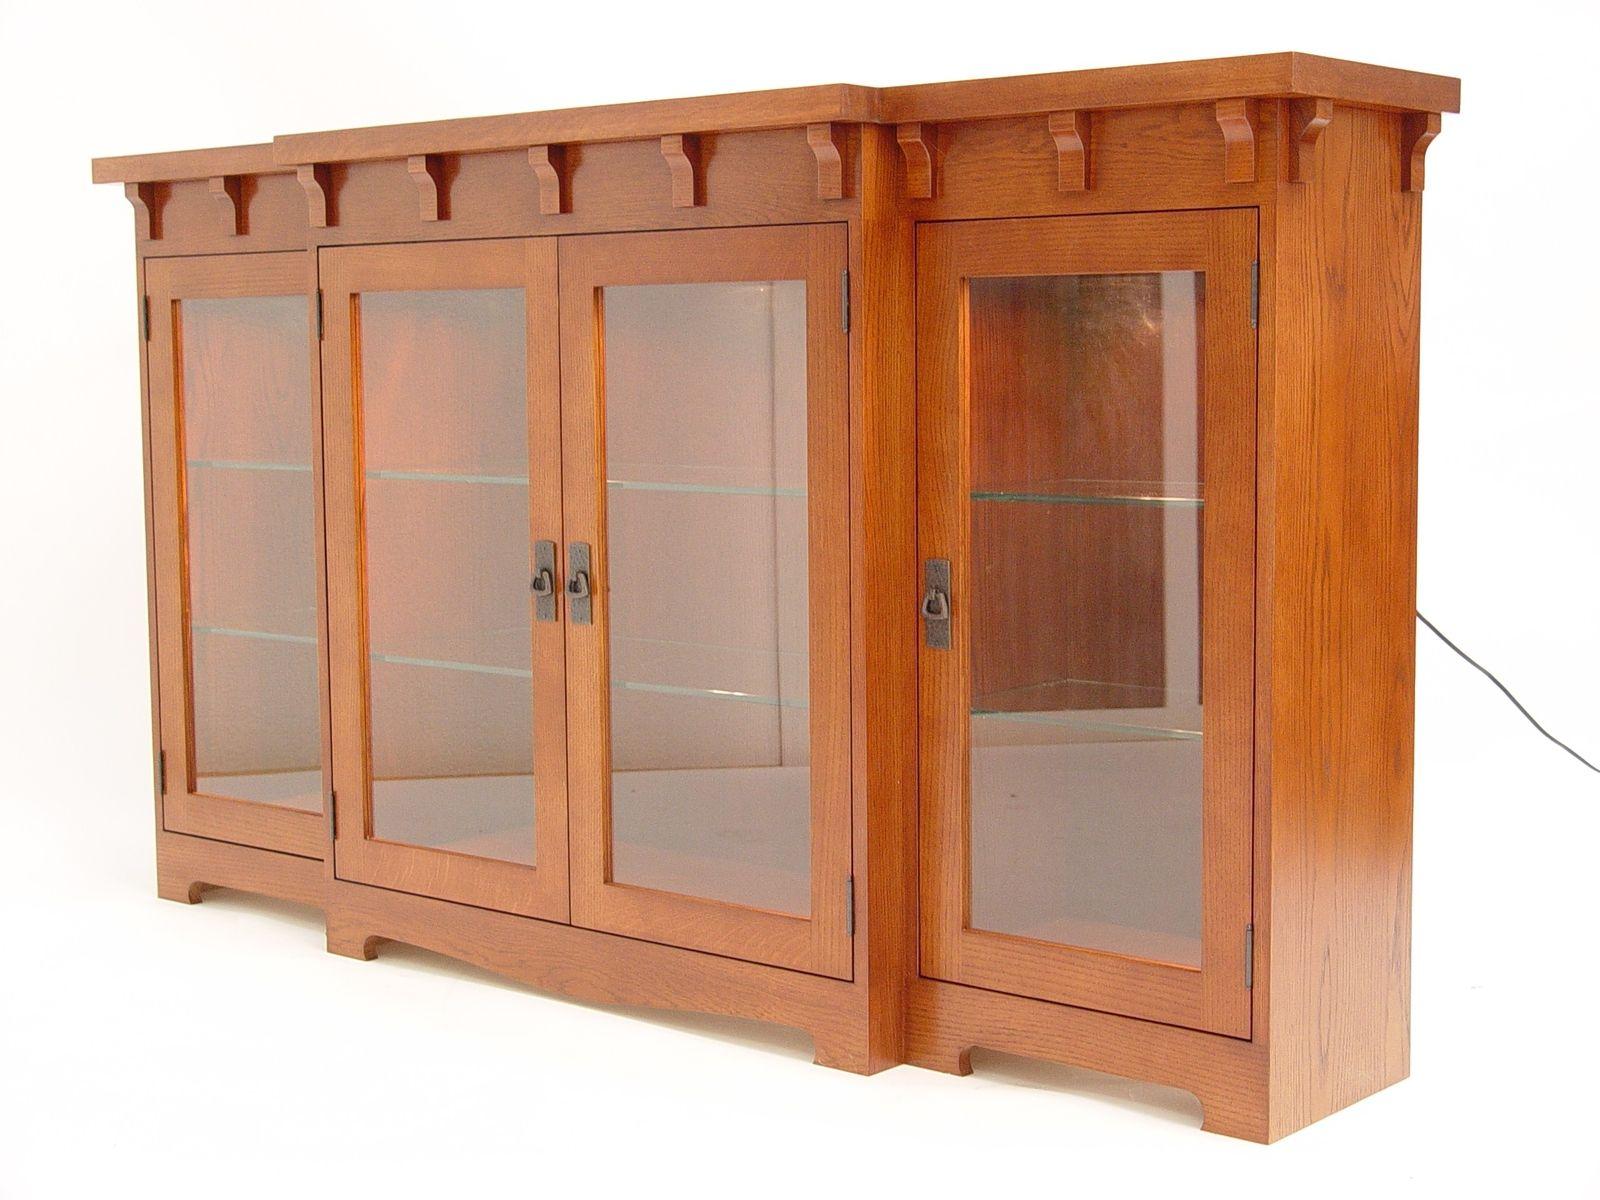 Custom Made Oak Arts Crafts Cabinet By Mckenzie Cabinetry